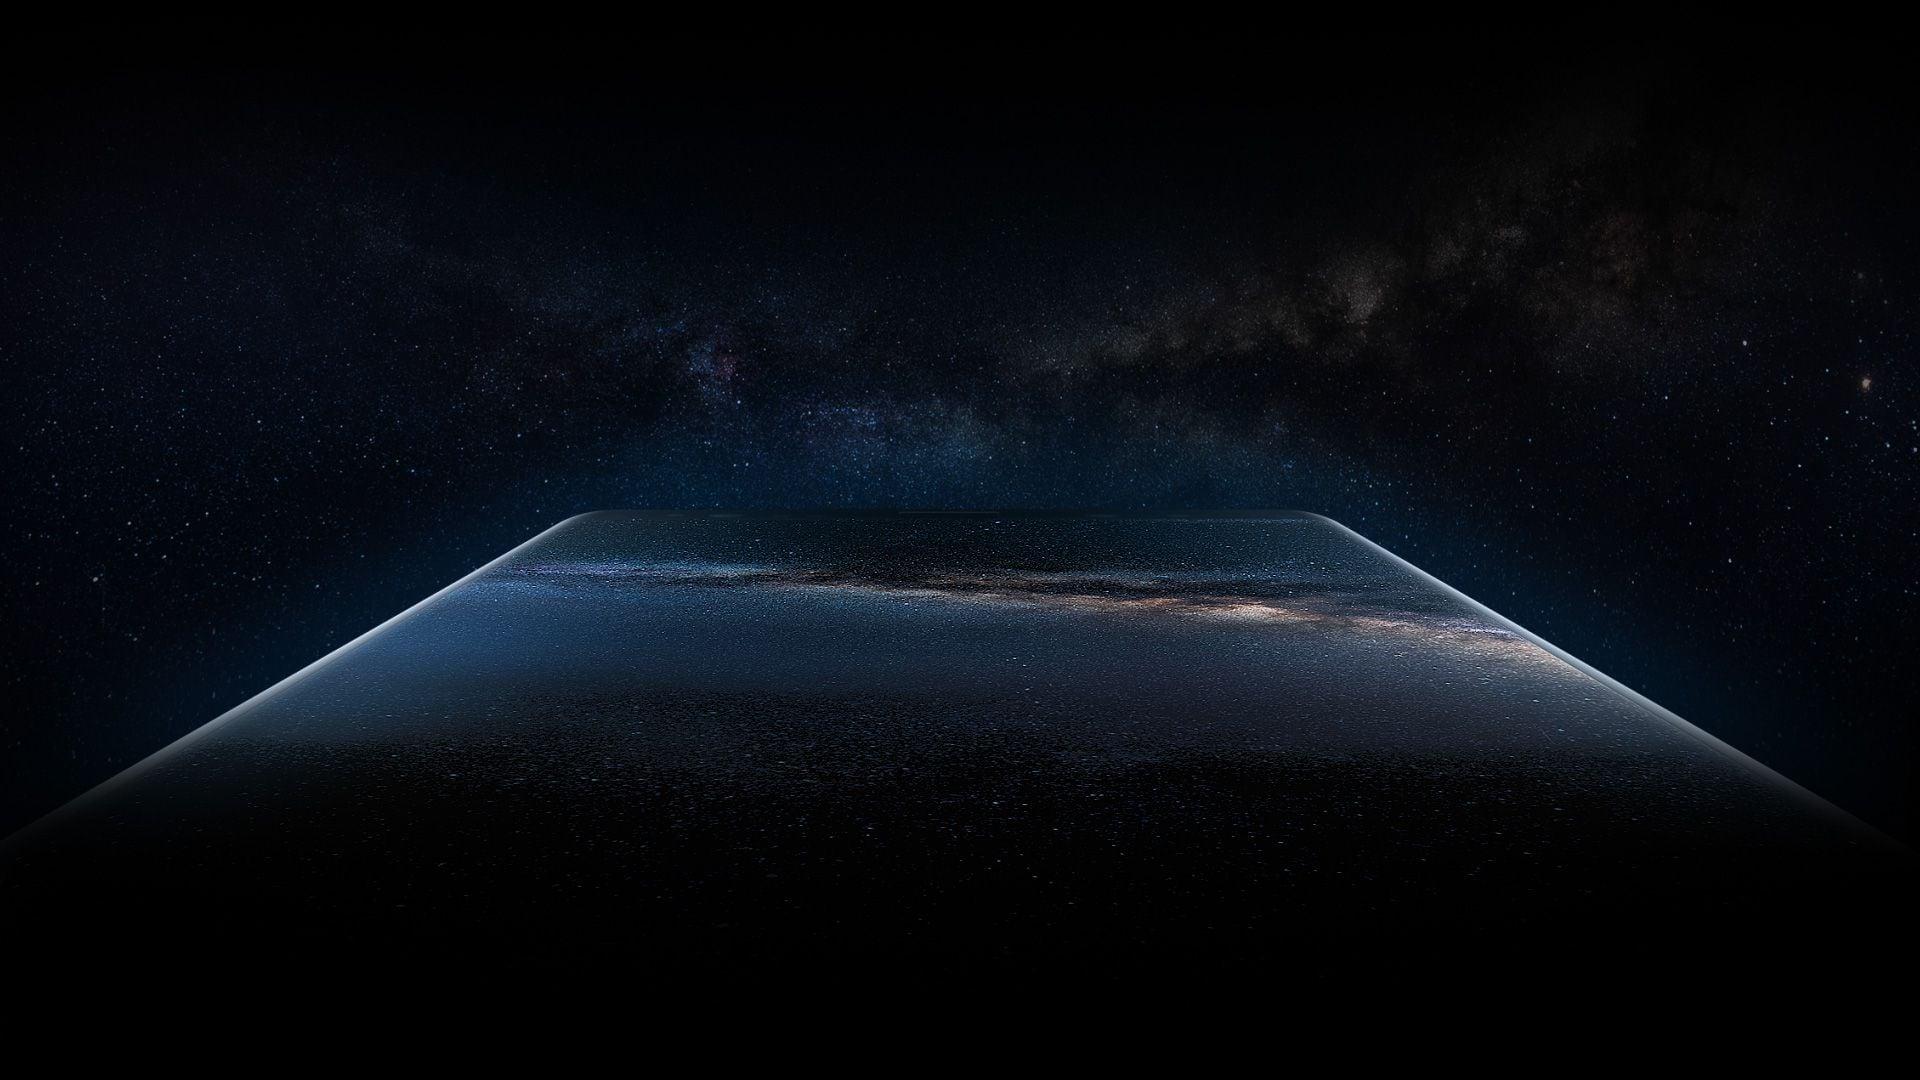 Image Samsung Dex Wallpaper 4k 1920x1080 Wallpaper Teahub Io